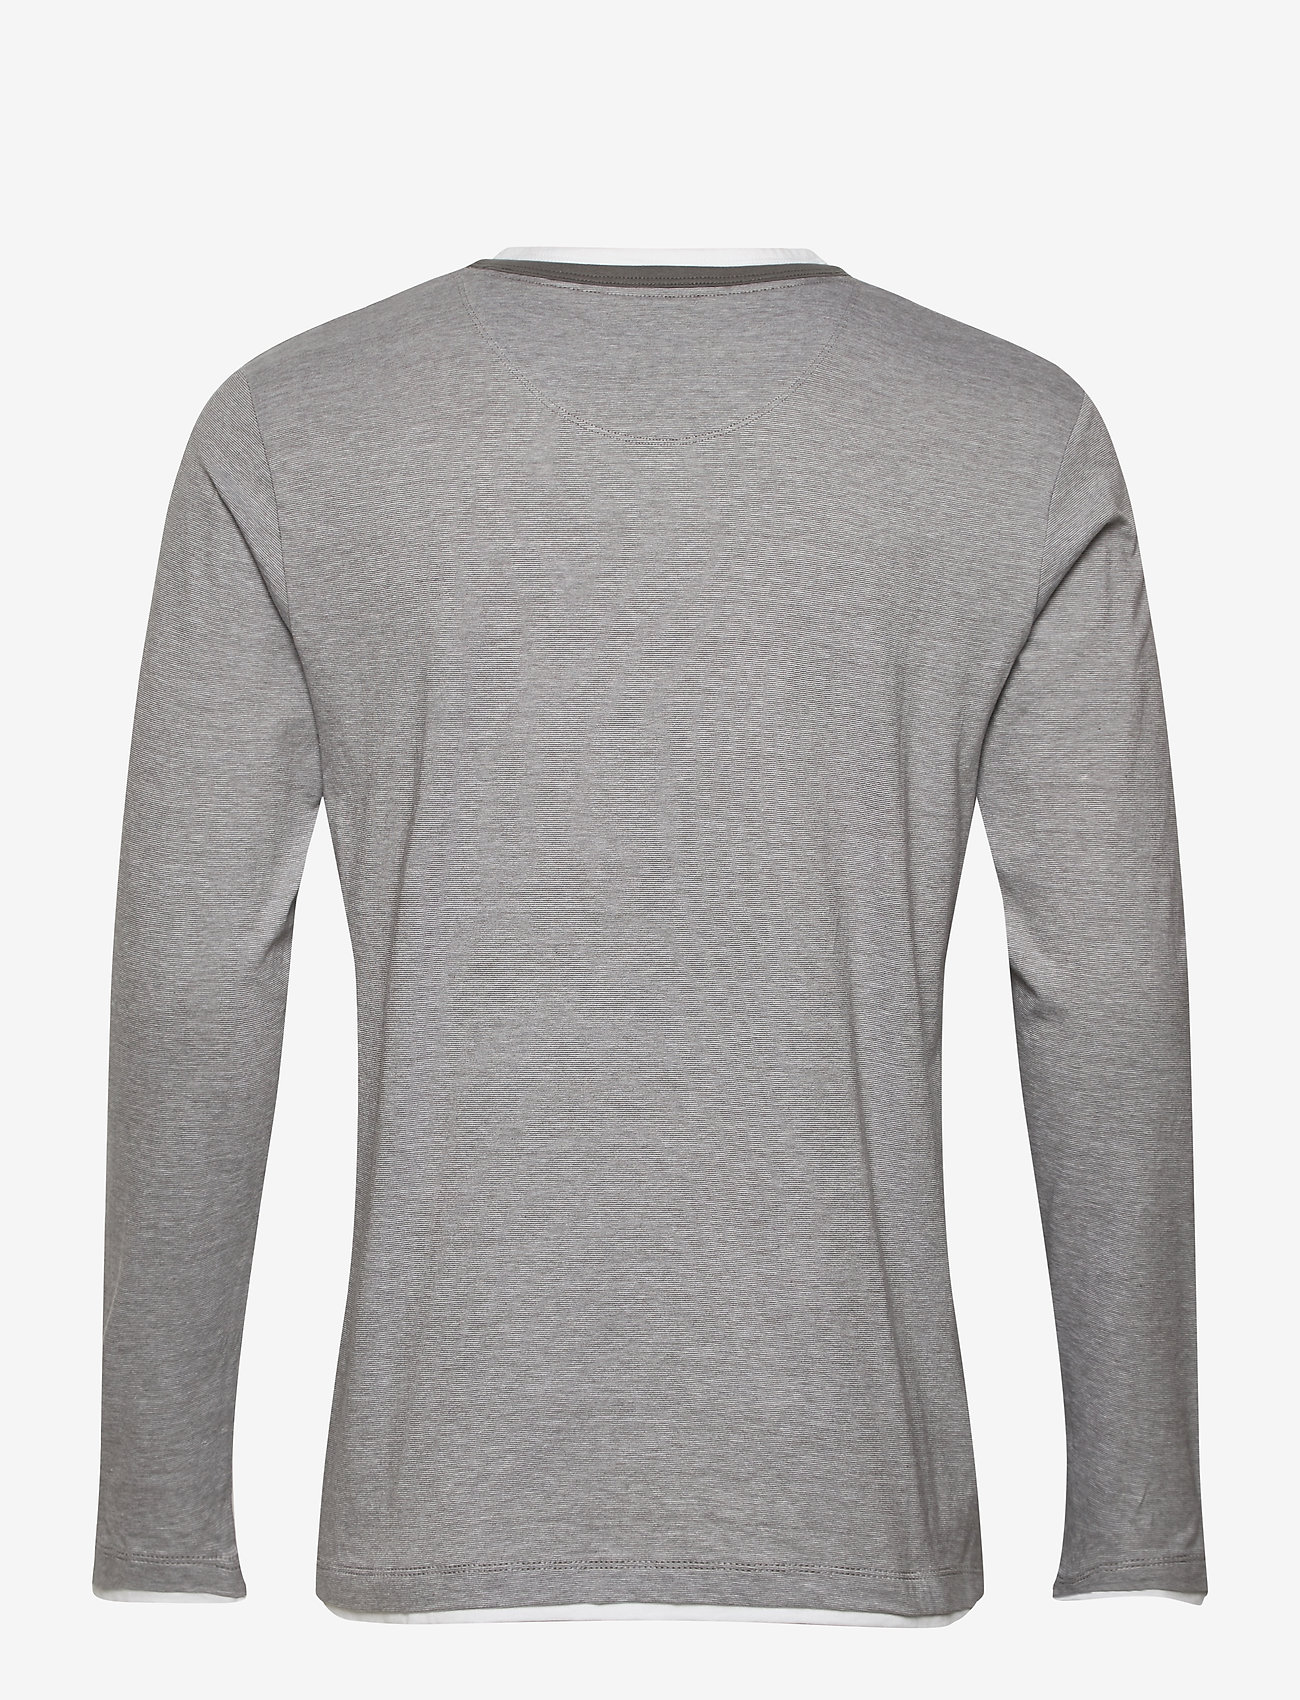 Esprit Casual - T-Shirts - basic t-shirts - medium grey 3 - 1